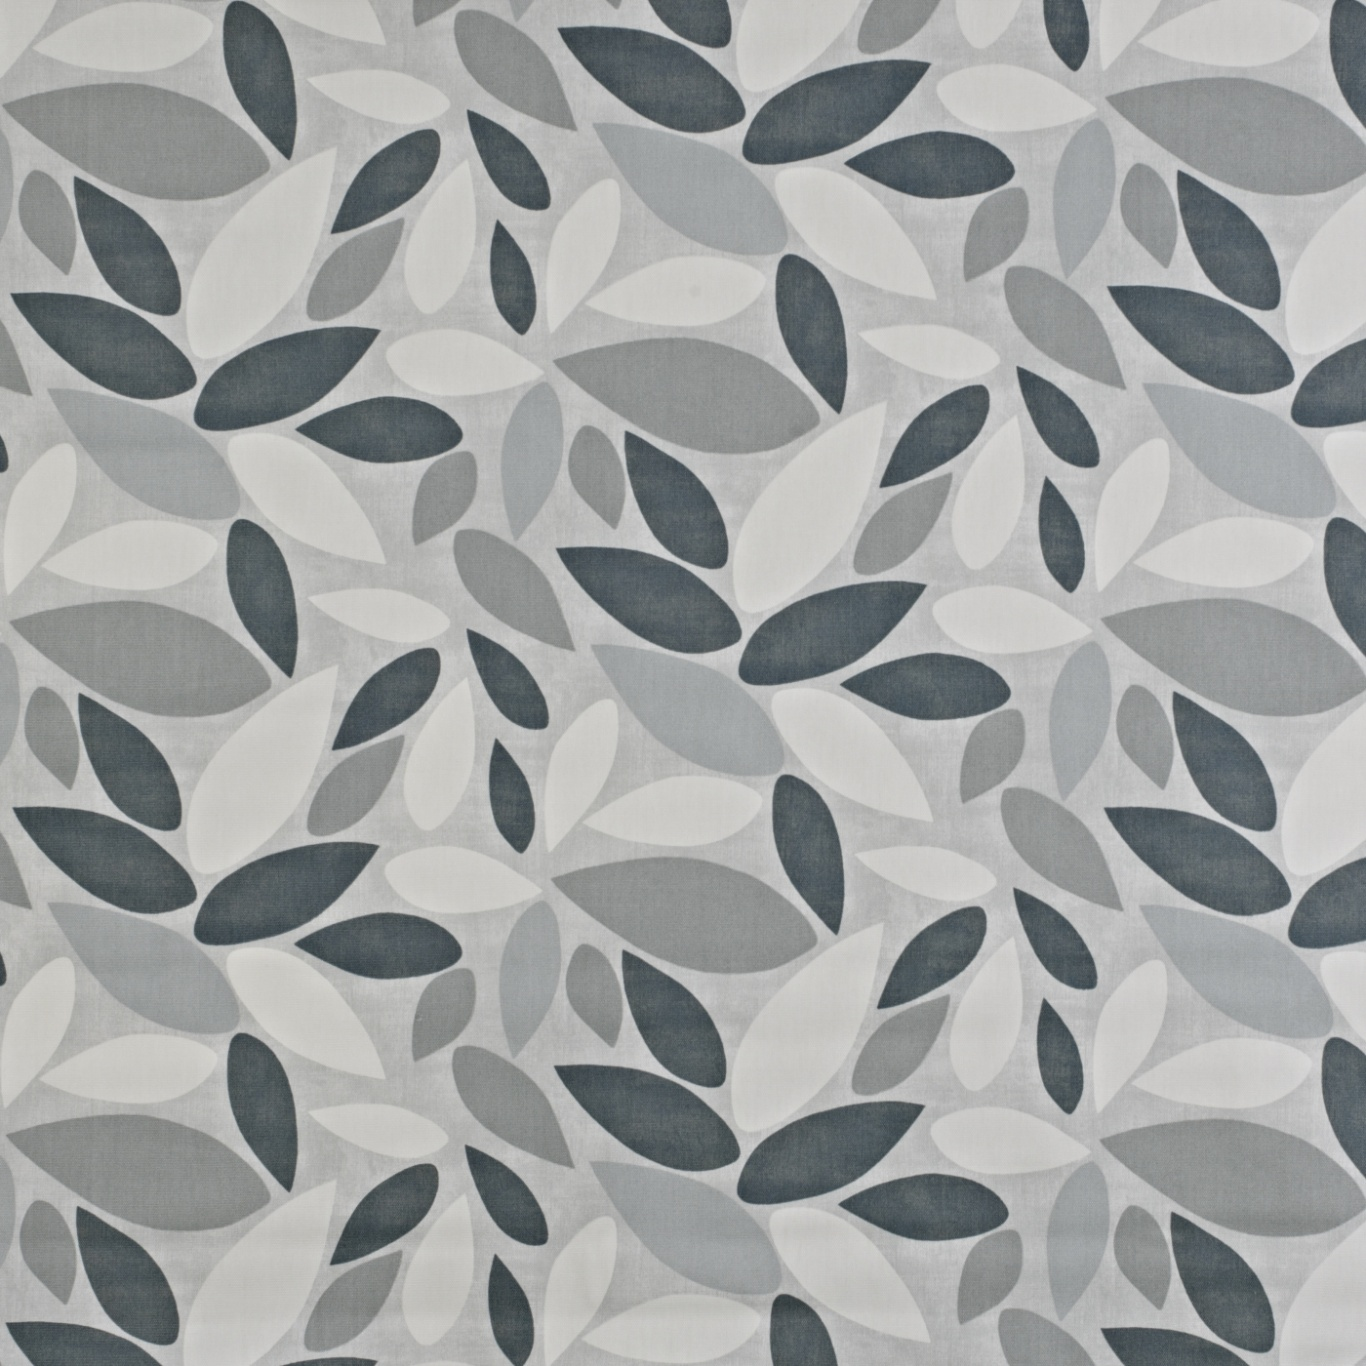 Image of Prestigious Pimlico Pebble Curtain Fabric